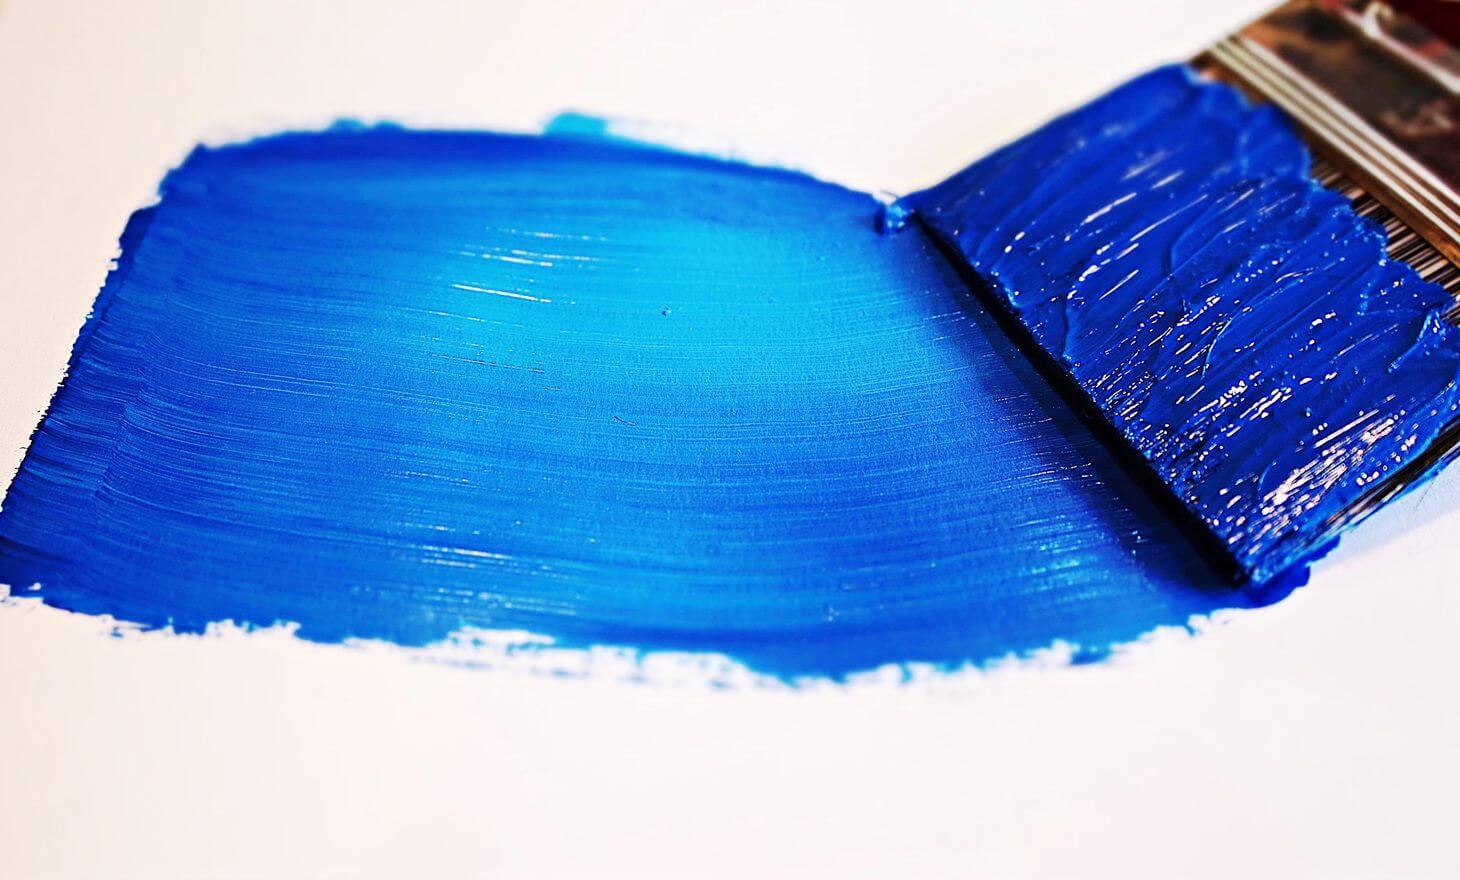 خرید و فروش پیگمنت آبی لاجورد - پیگمنت آبی 29